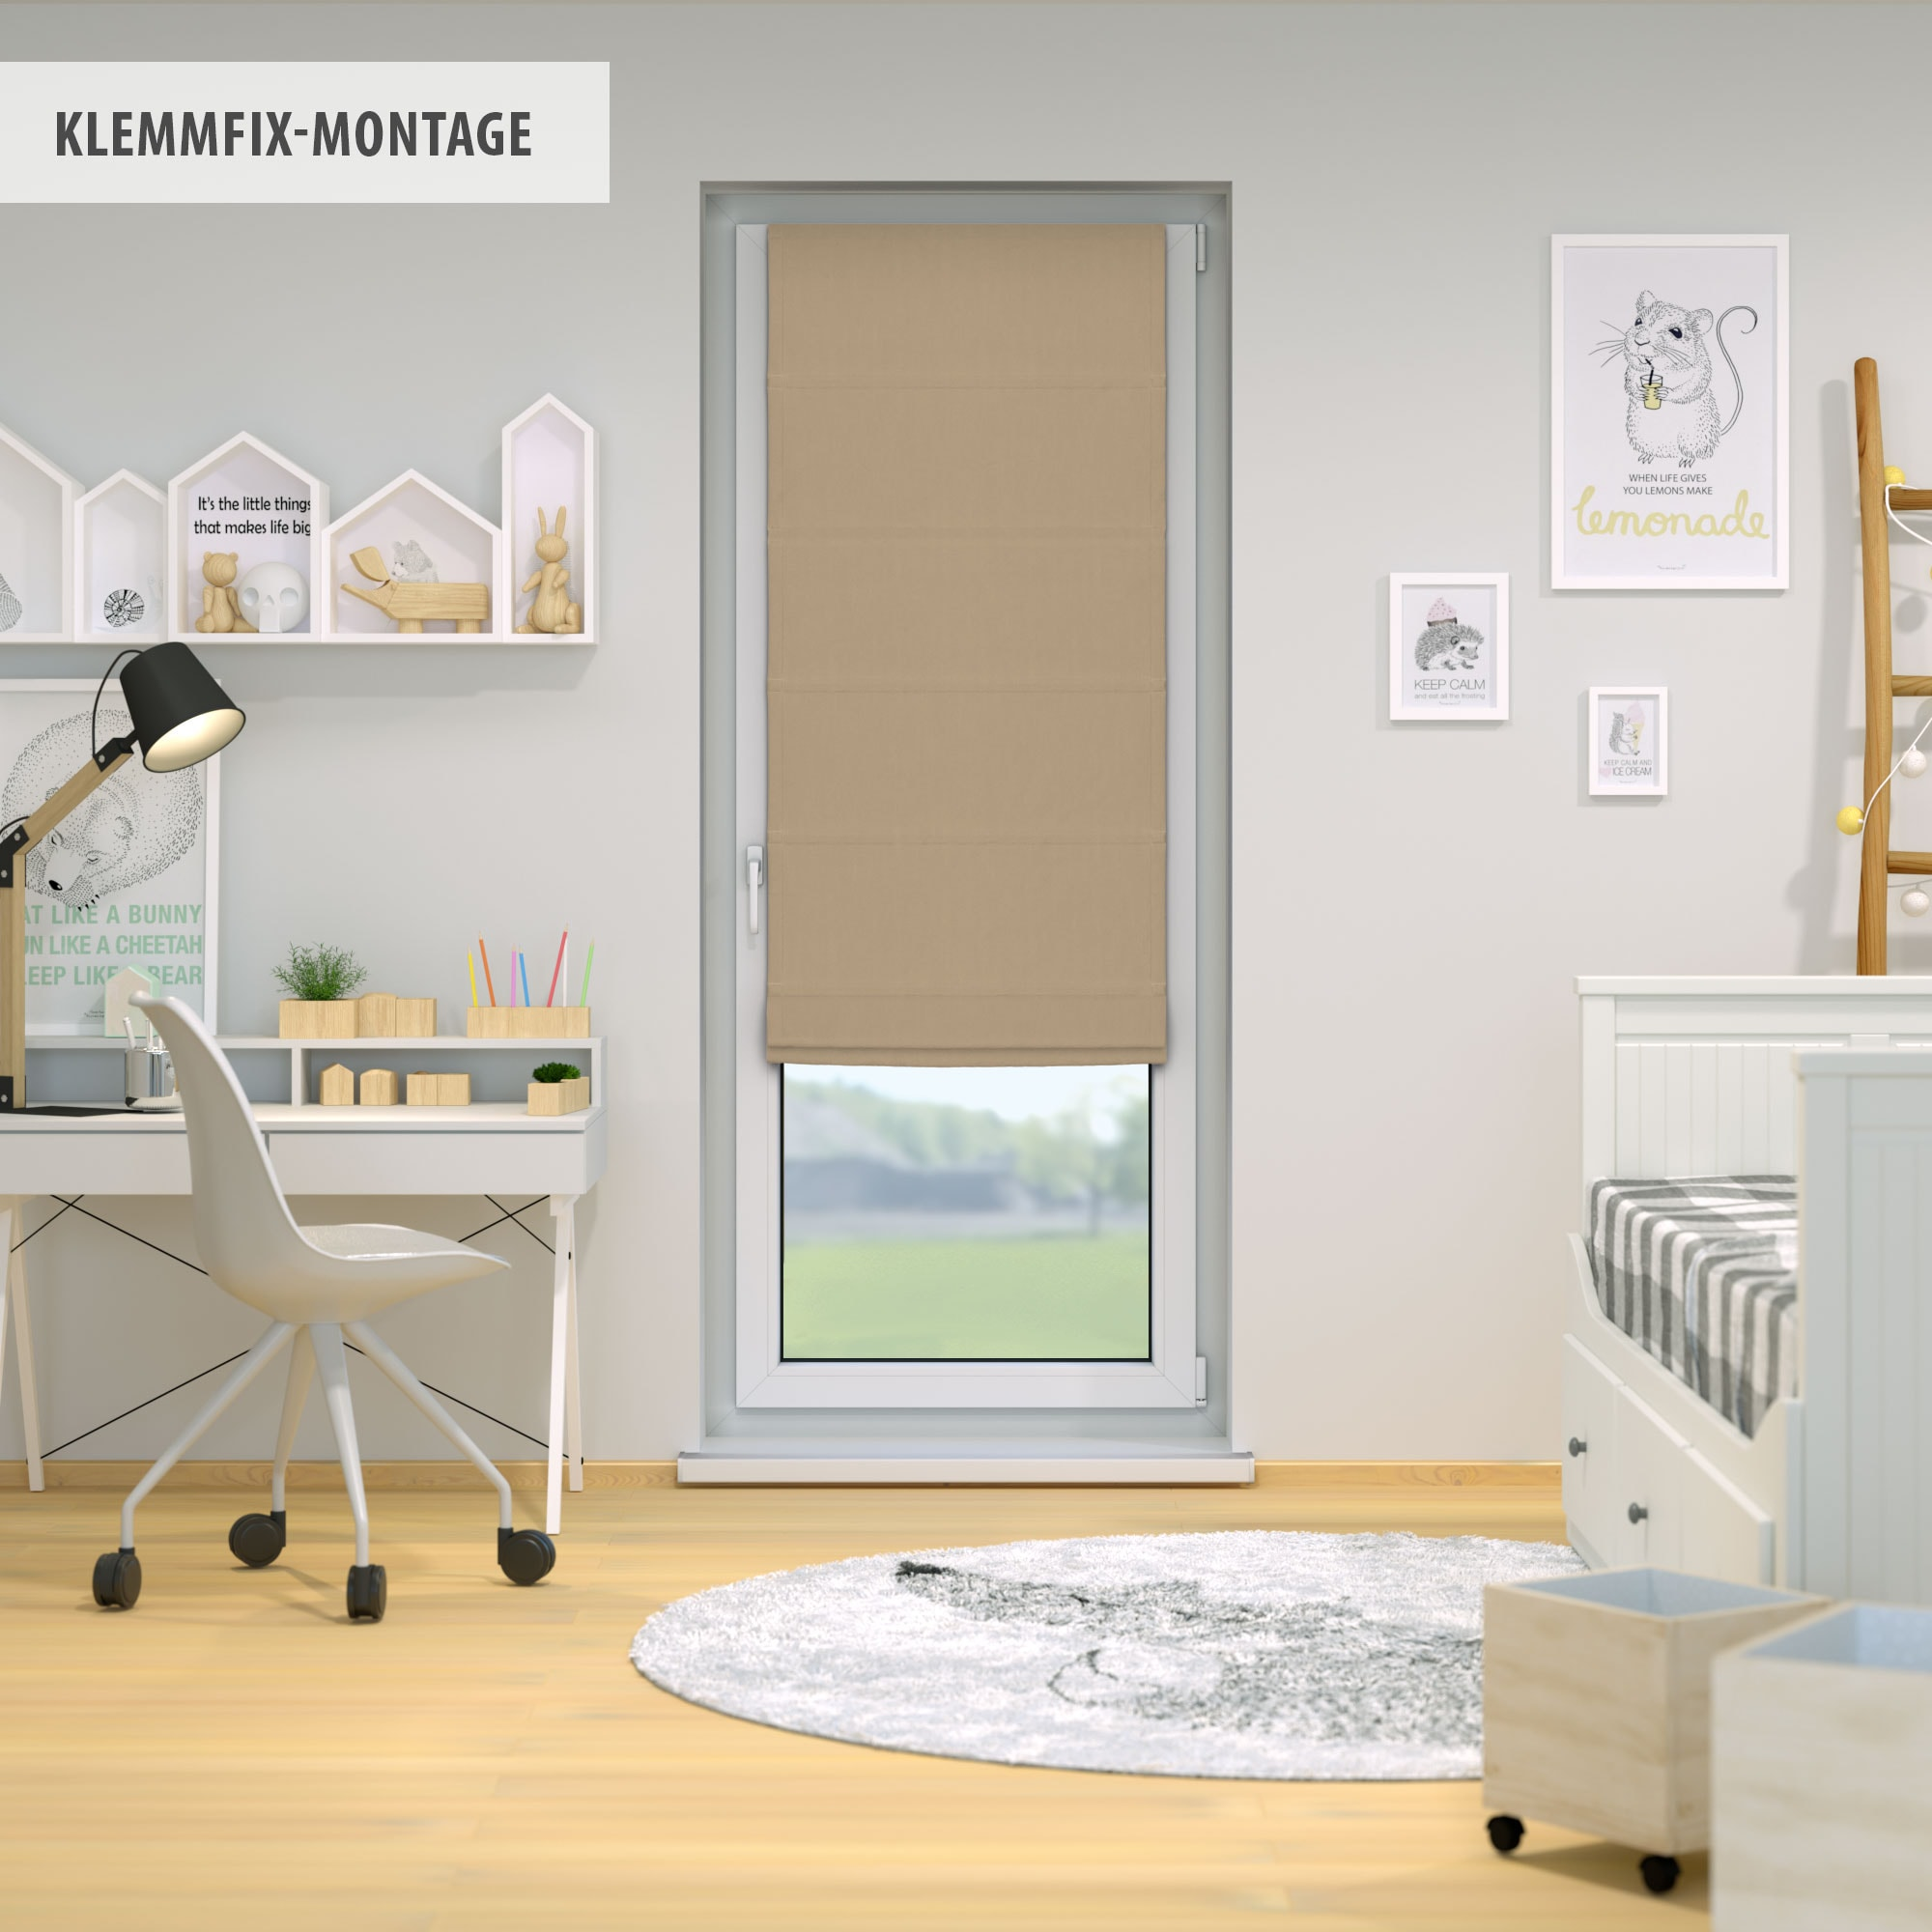 klemmfix raffrollo 140 x 240cm beige victoria m. Black Bedroom Furniture Sets. Home Design Ideas